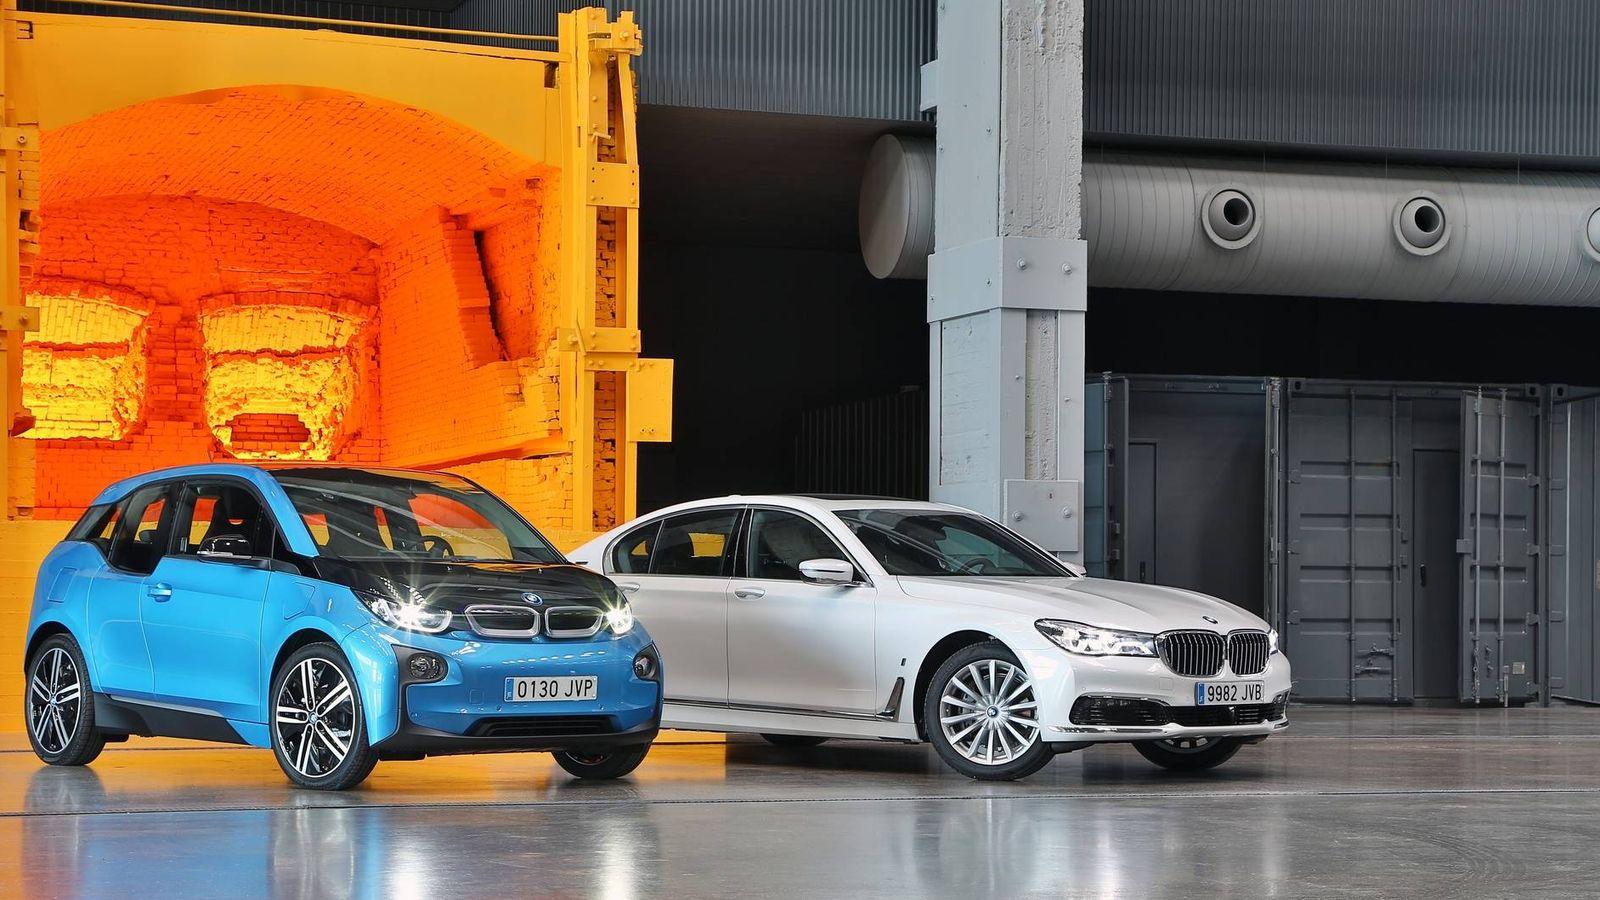 Foto: BMW Innovation Days, el futuro del automóvil